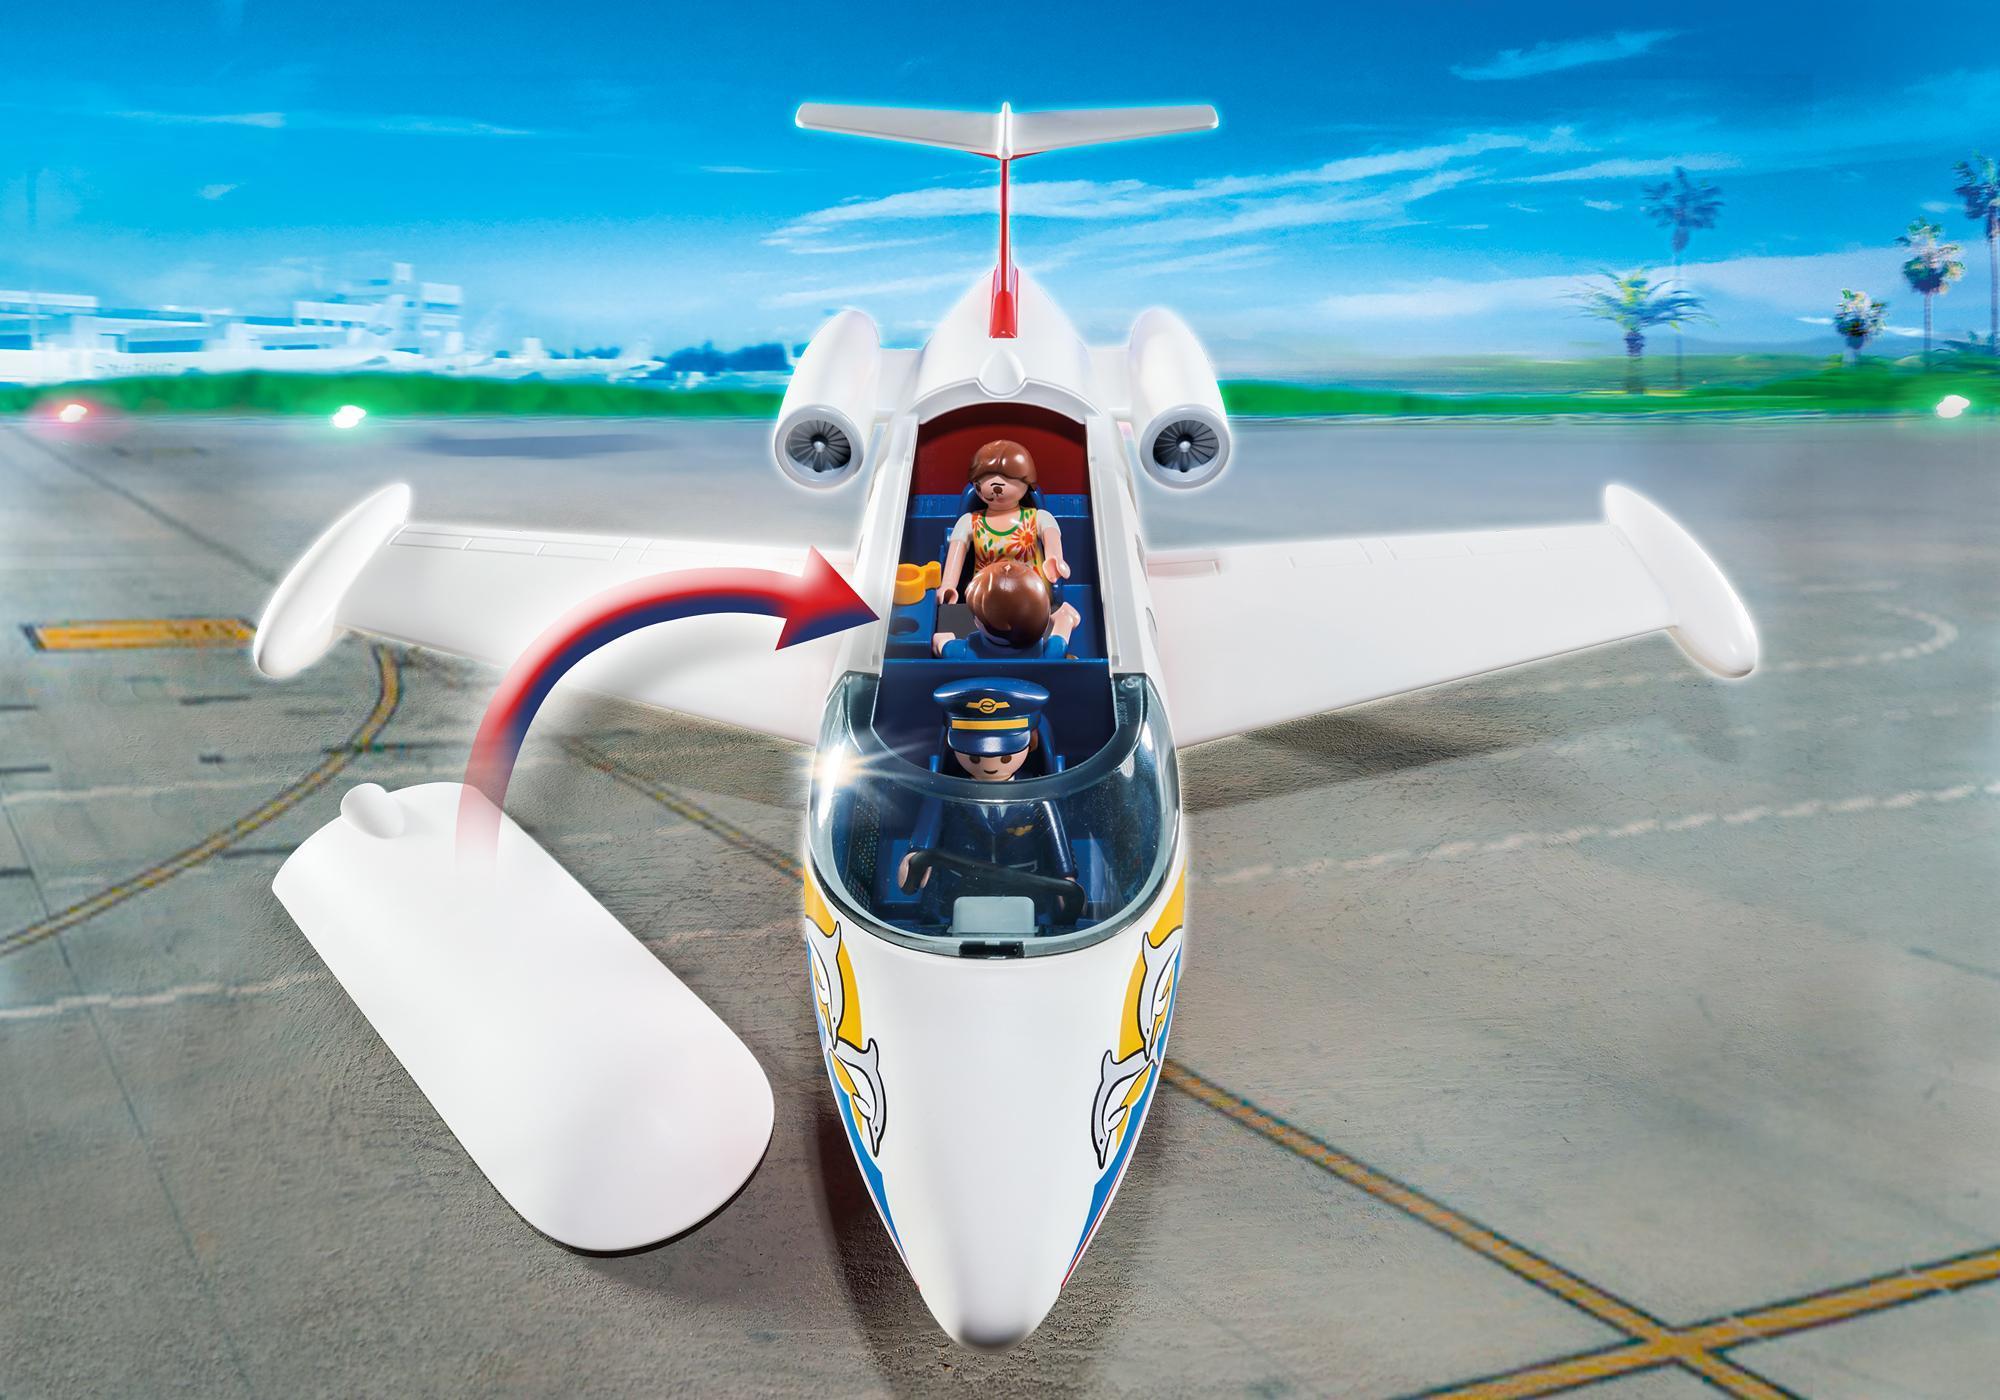 http://media.playmobil.com/i/playmobil/6081_product_extra1/Vakantievliegtuig